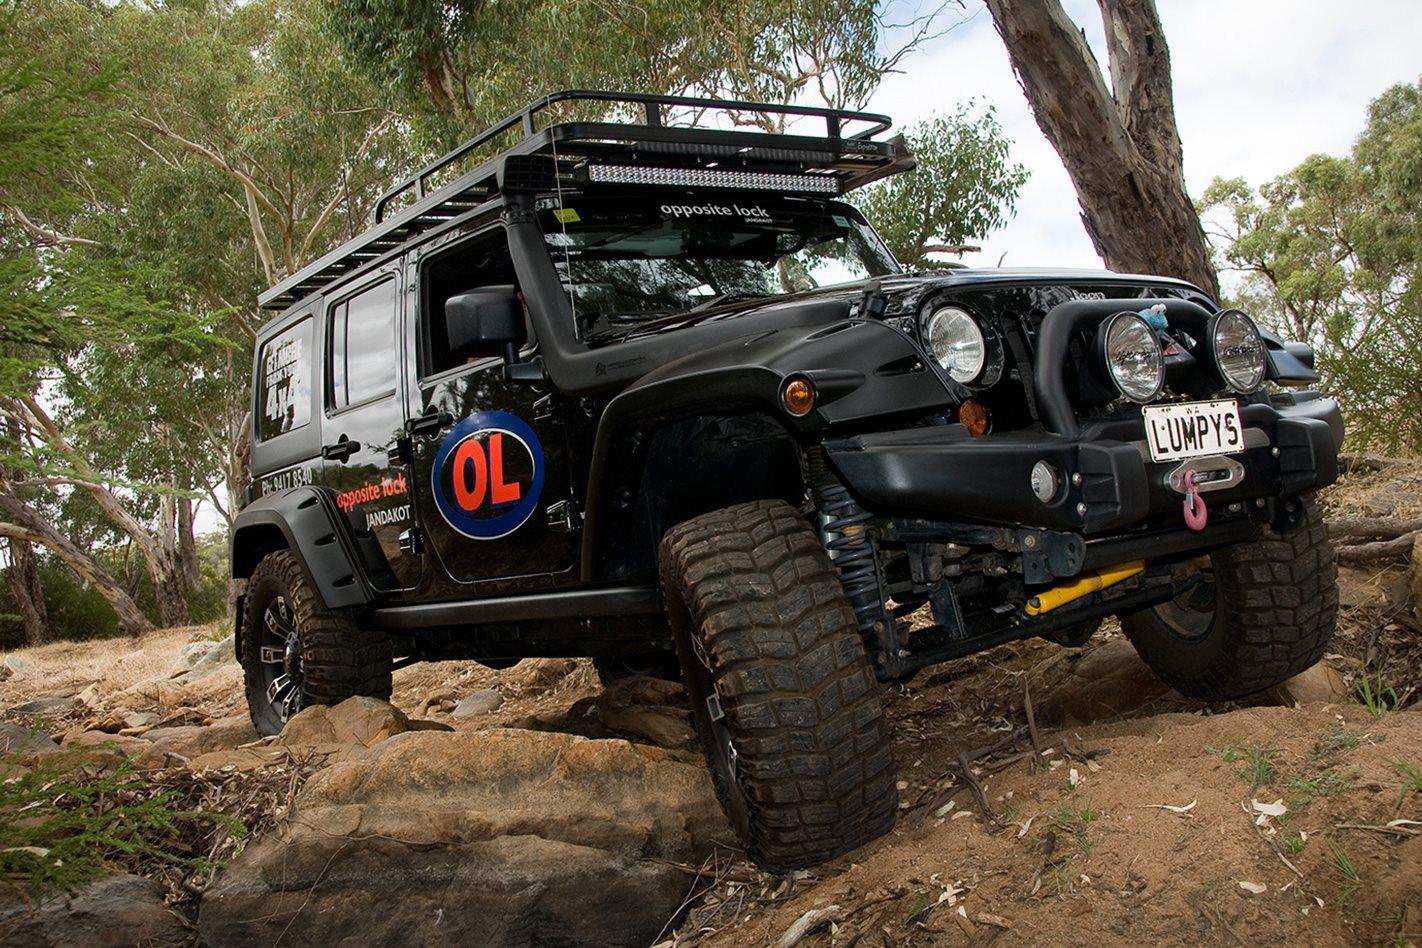 Opposite-Lock-equipped-Jeep-Rubicon-wheel-axles.jpg